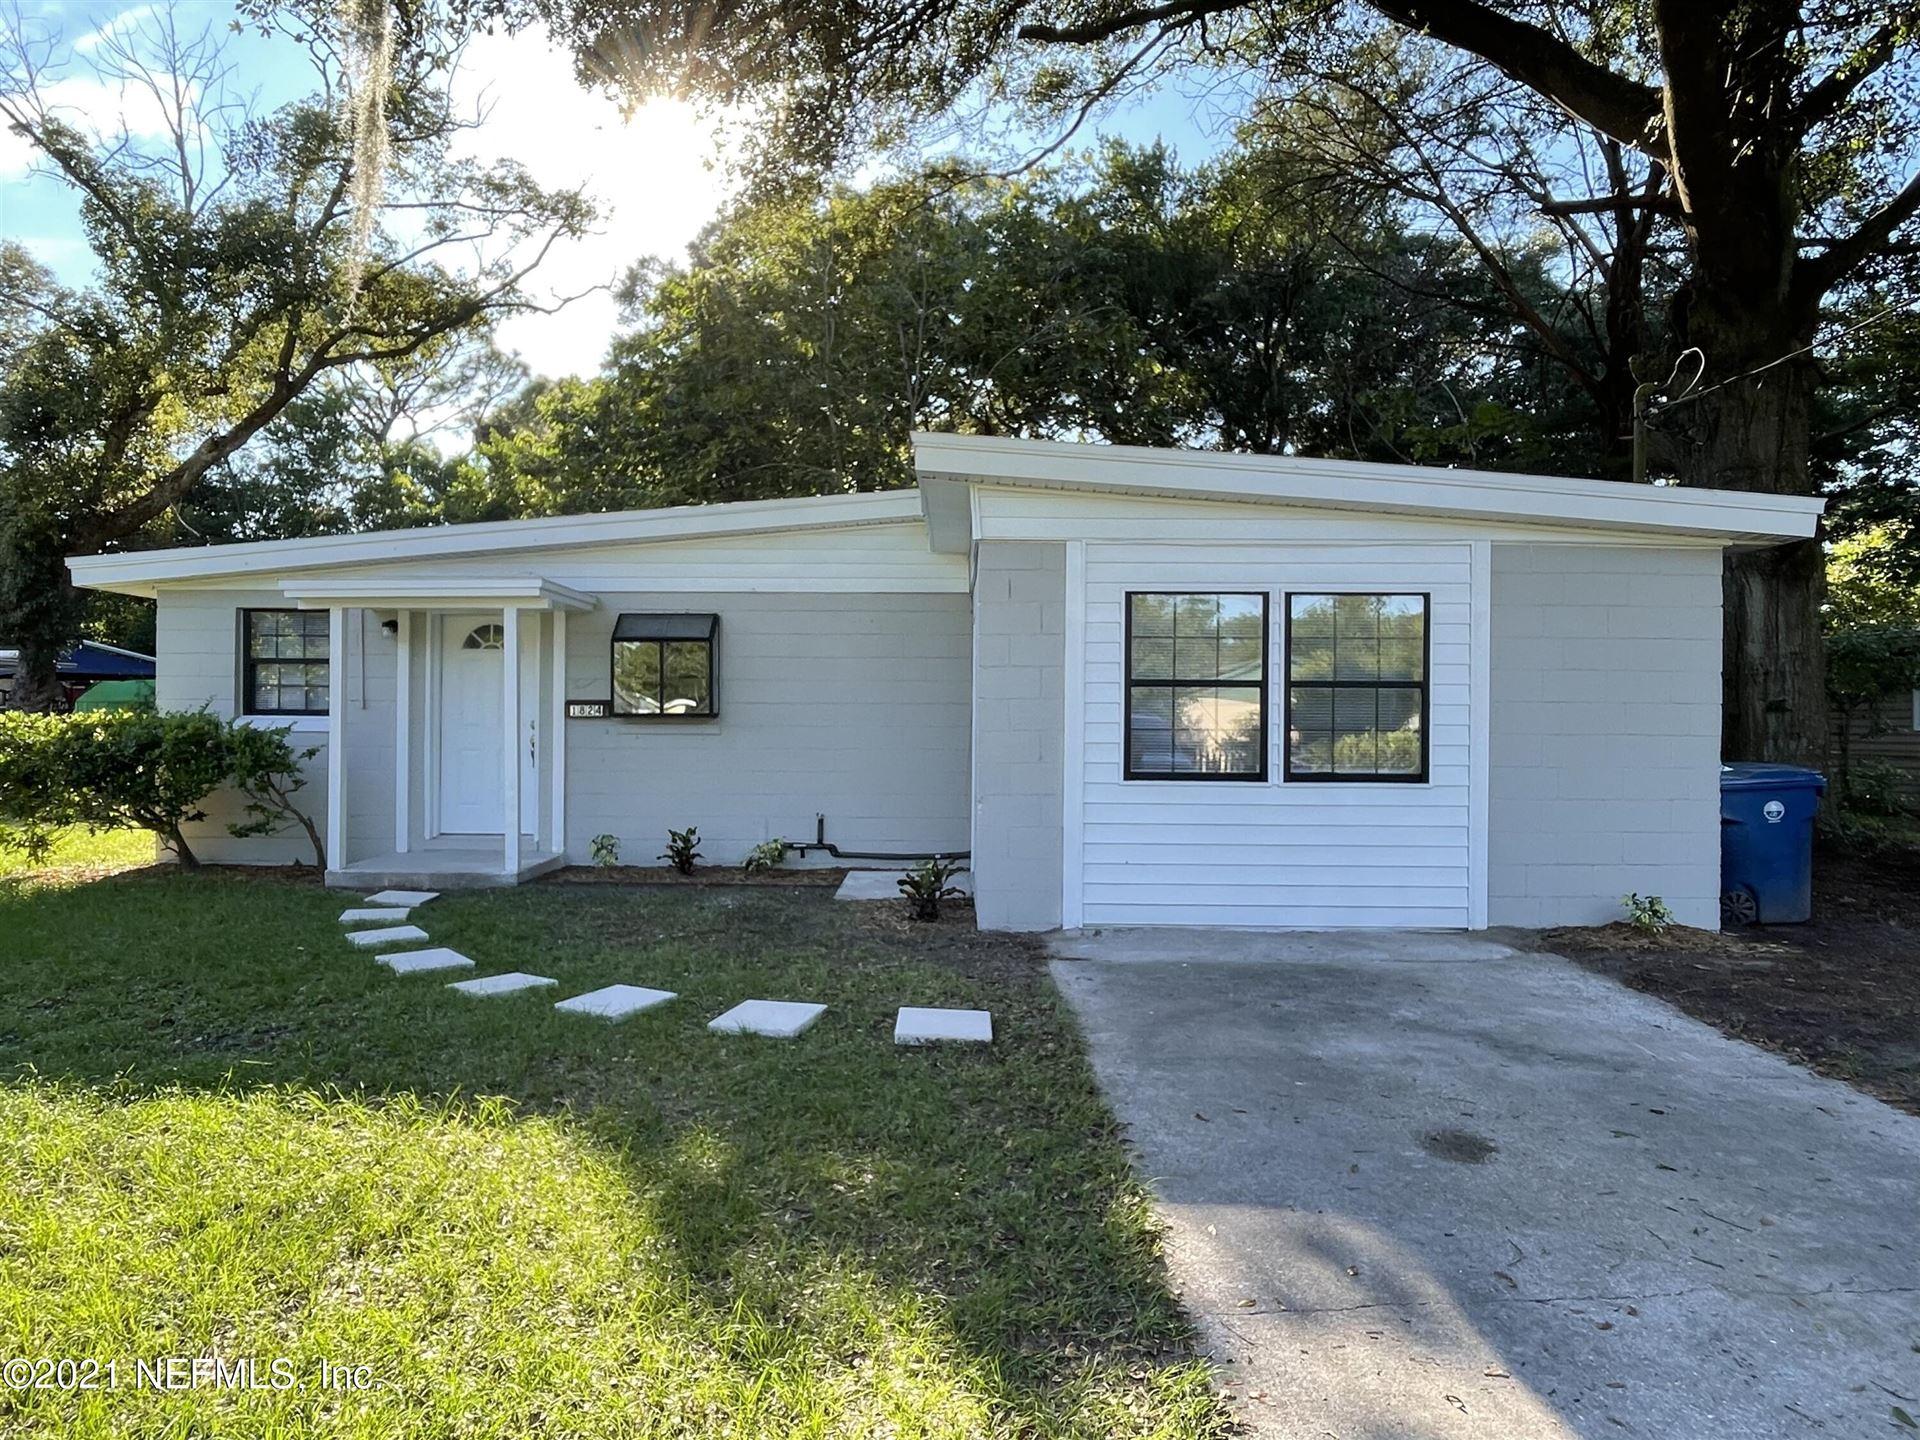 1824 GRIFLET RD, Jacksonville, FL 32211 - MLS#: 1132206